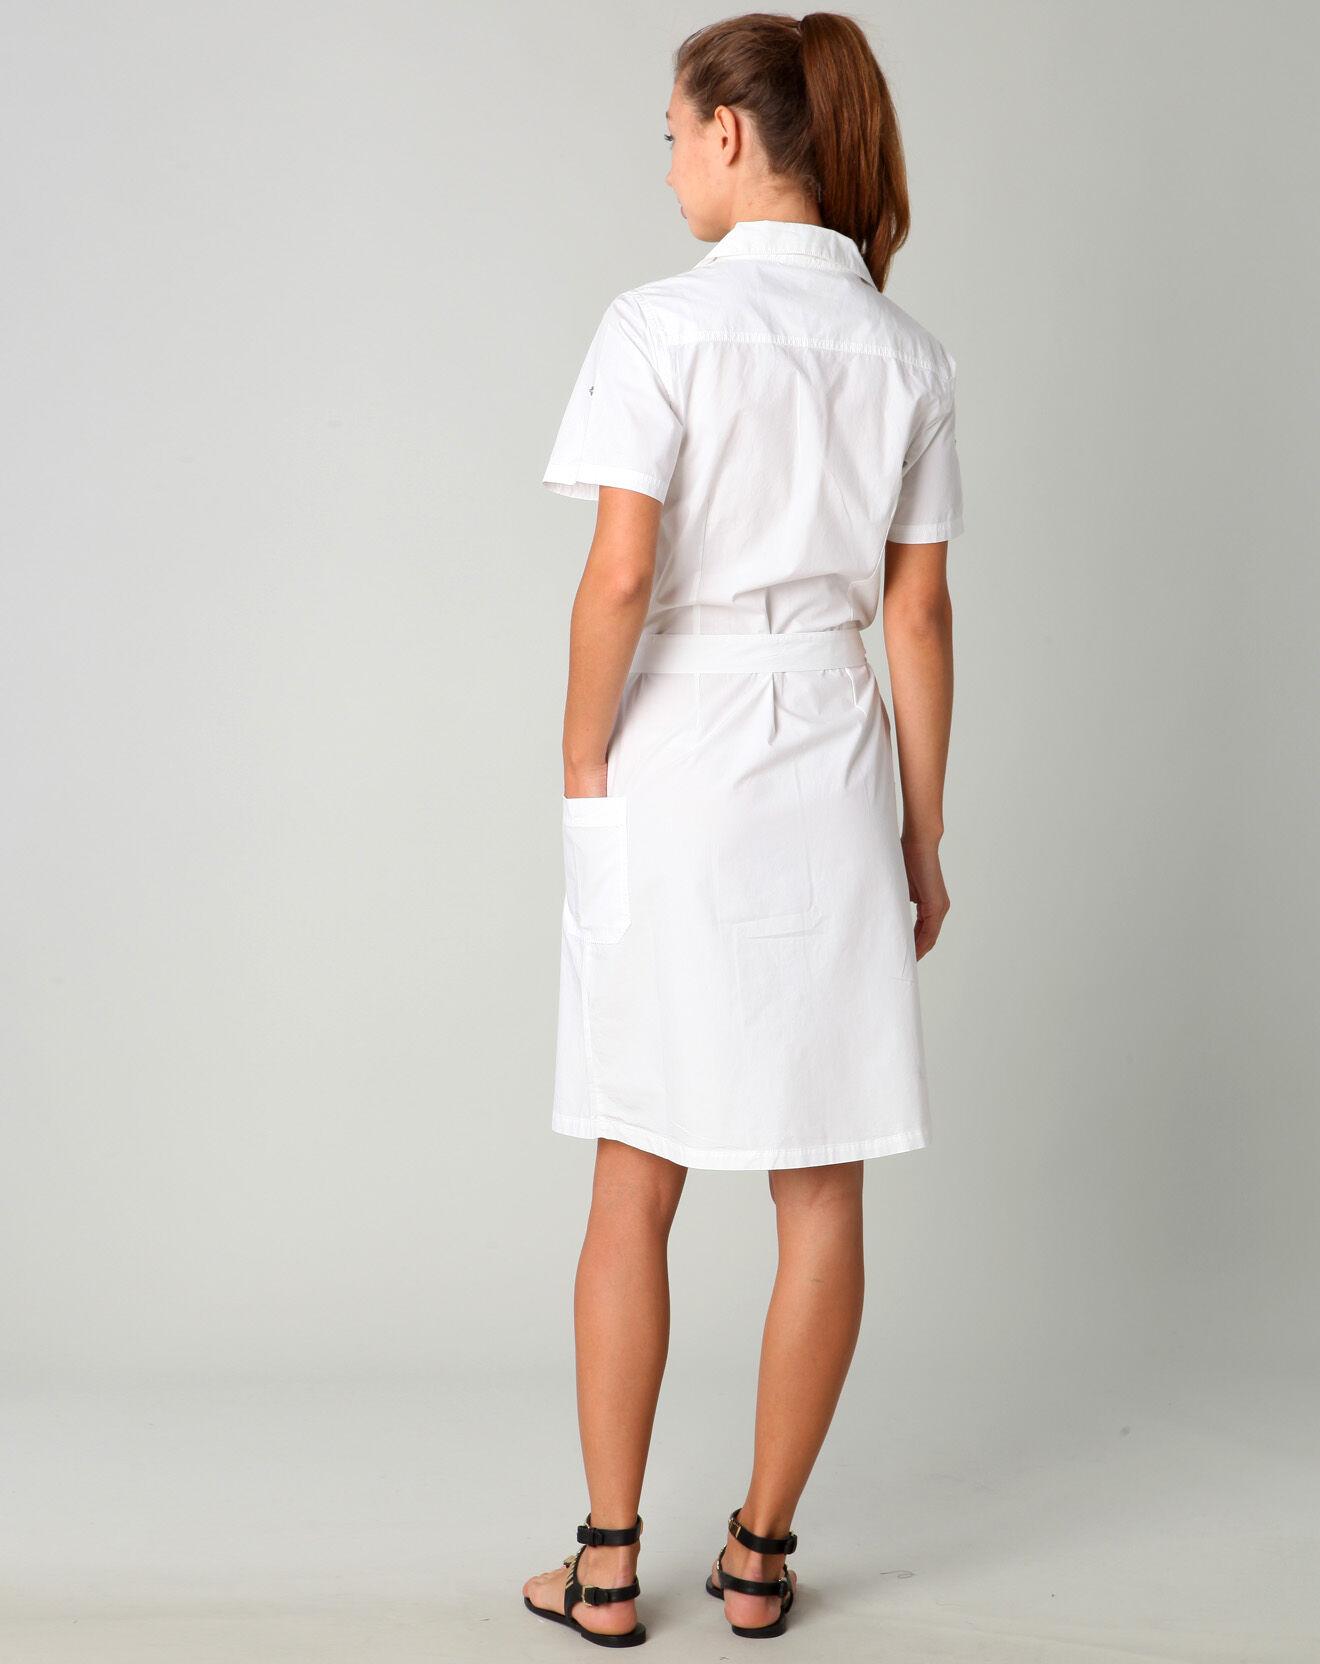 Poivre-blanc-Robe-chemise-cactus-blanche